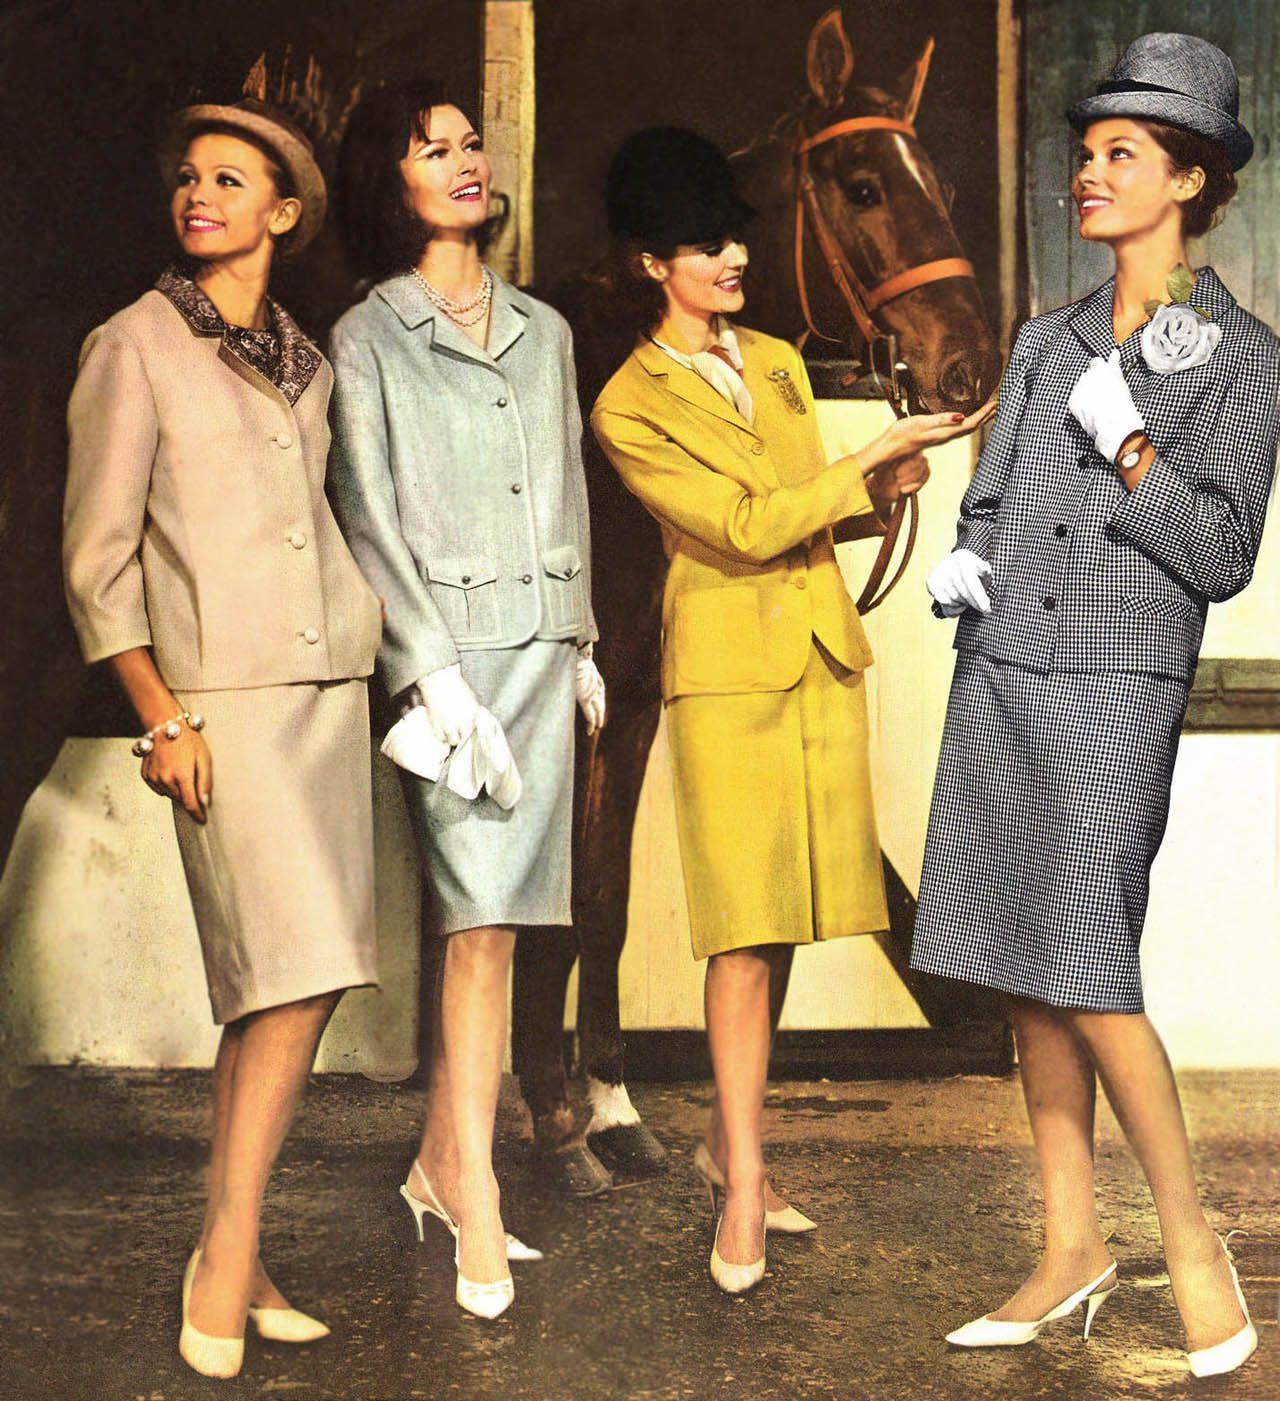 fashion for women 1964 1960 1969 clothes accessories pinterest mode des ann es 60. Black Bedroom Furniture Sets. Home Design Ideas